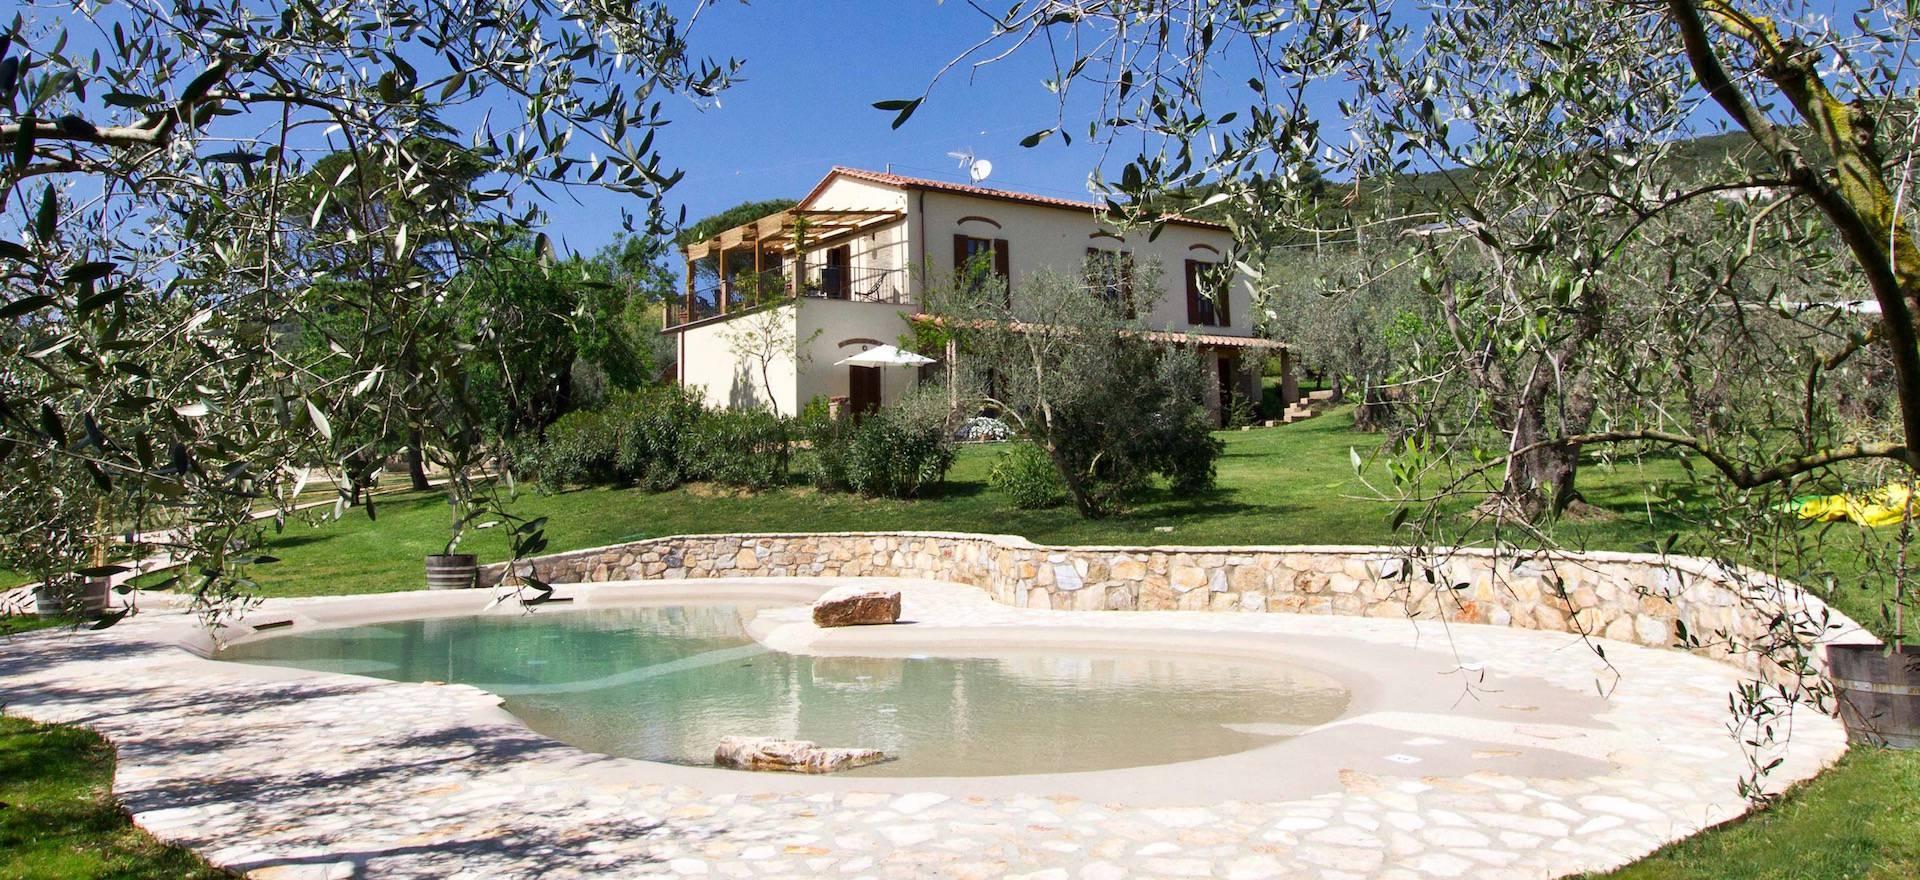 Agriturismo Tuscany Agriturismo Tuscany, in olive grove near the sea